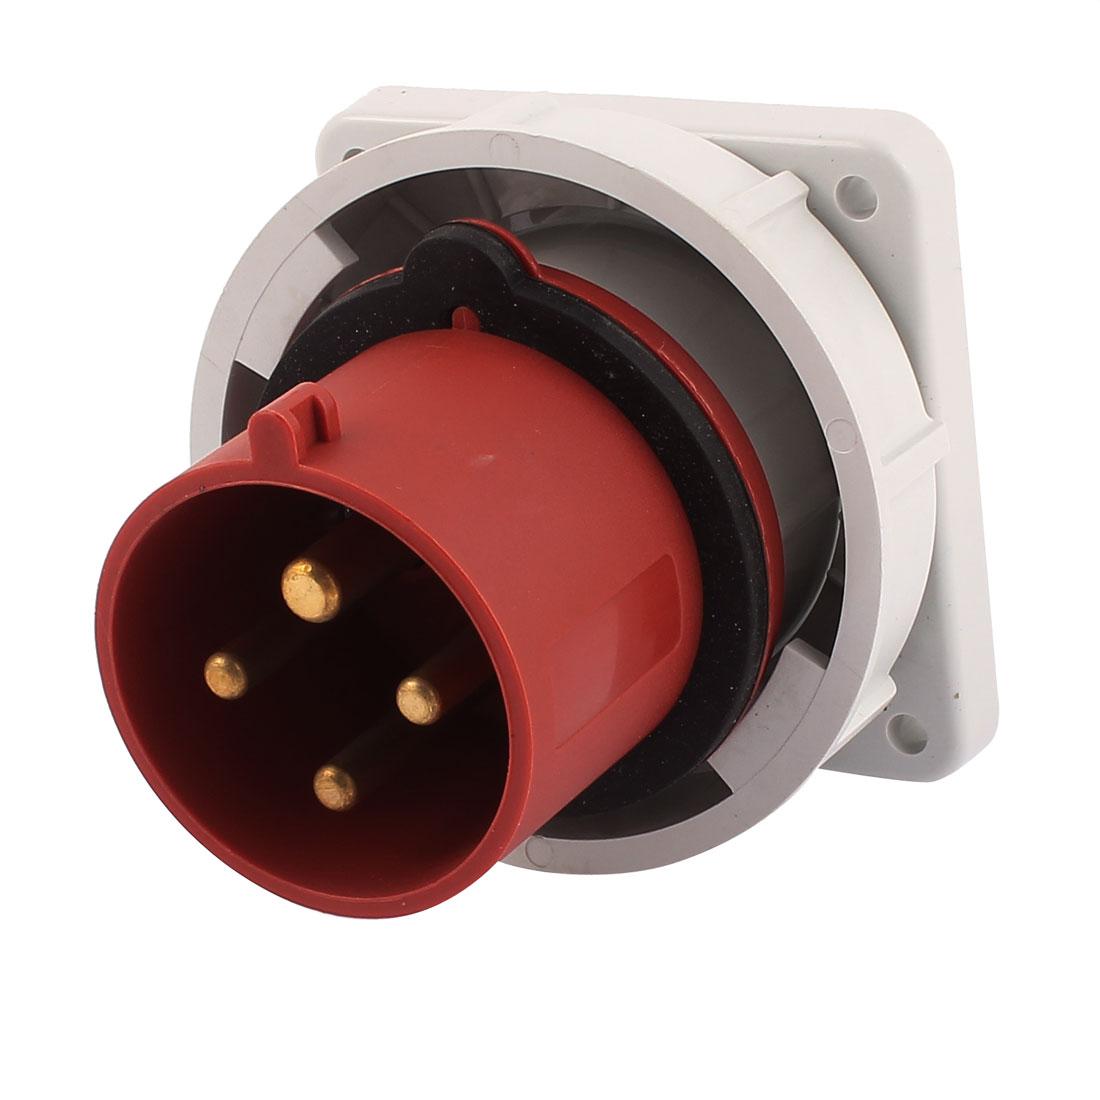 AC 380V-415V 32A IP67 3P+E 4 Terminal Male Industrial Panel Mounting Plug